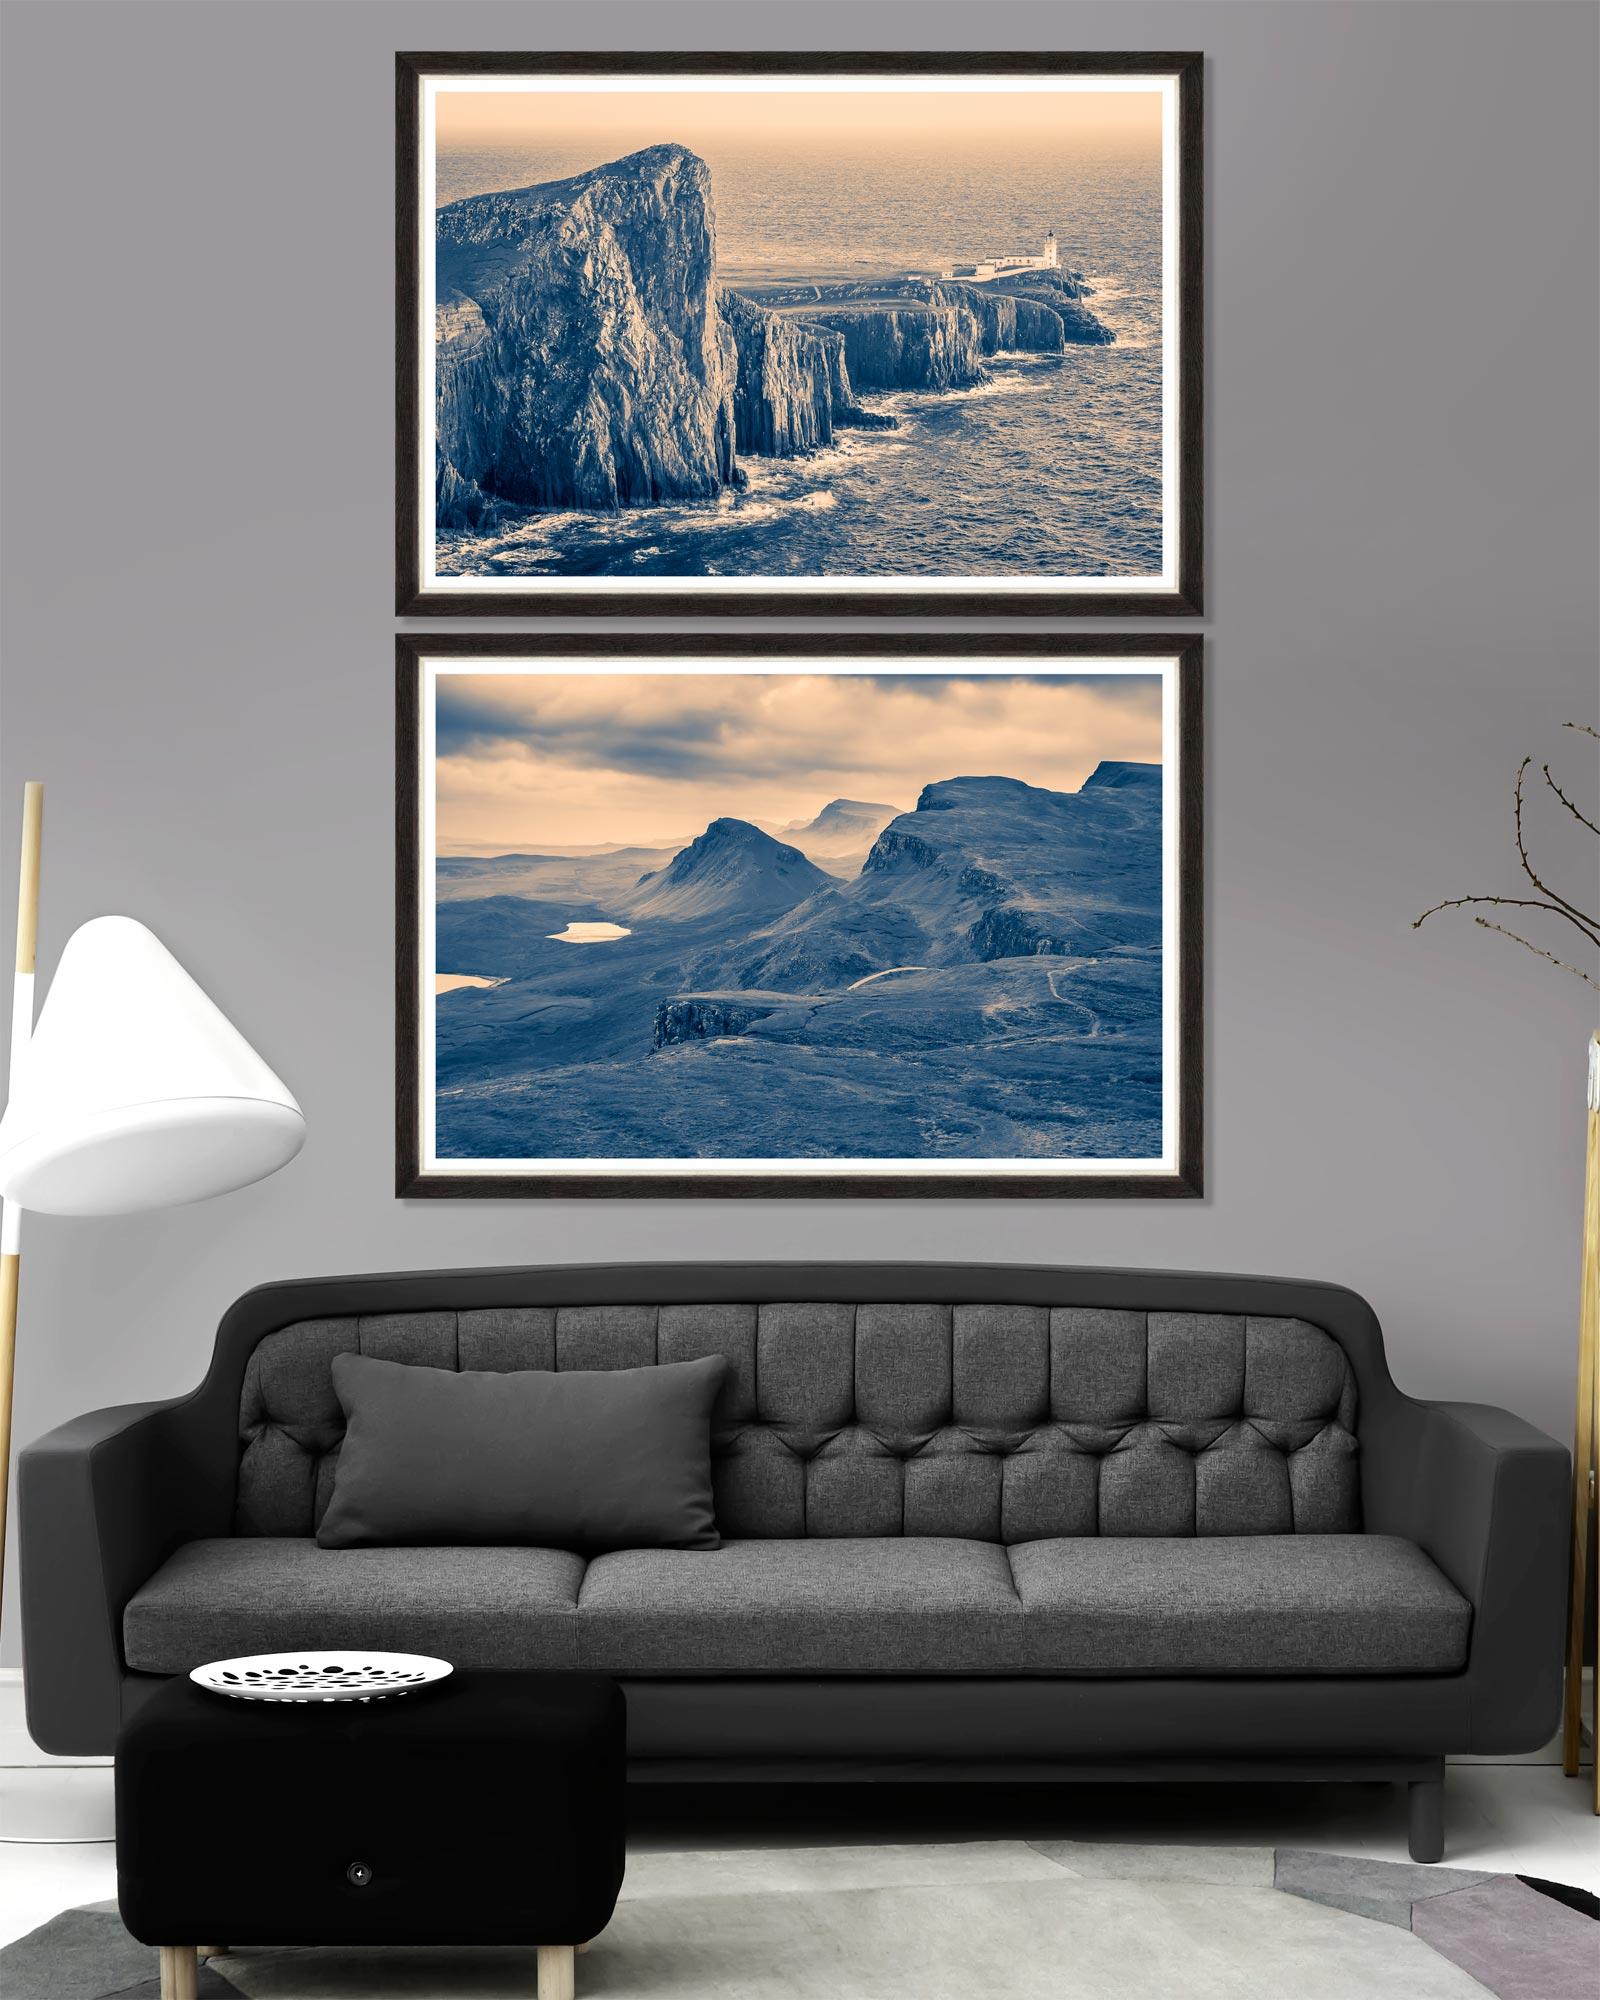 Tablou 2 piese Framed Art Nordic Scenery imagine